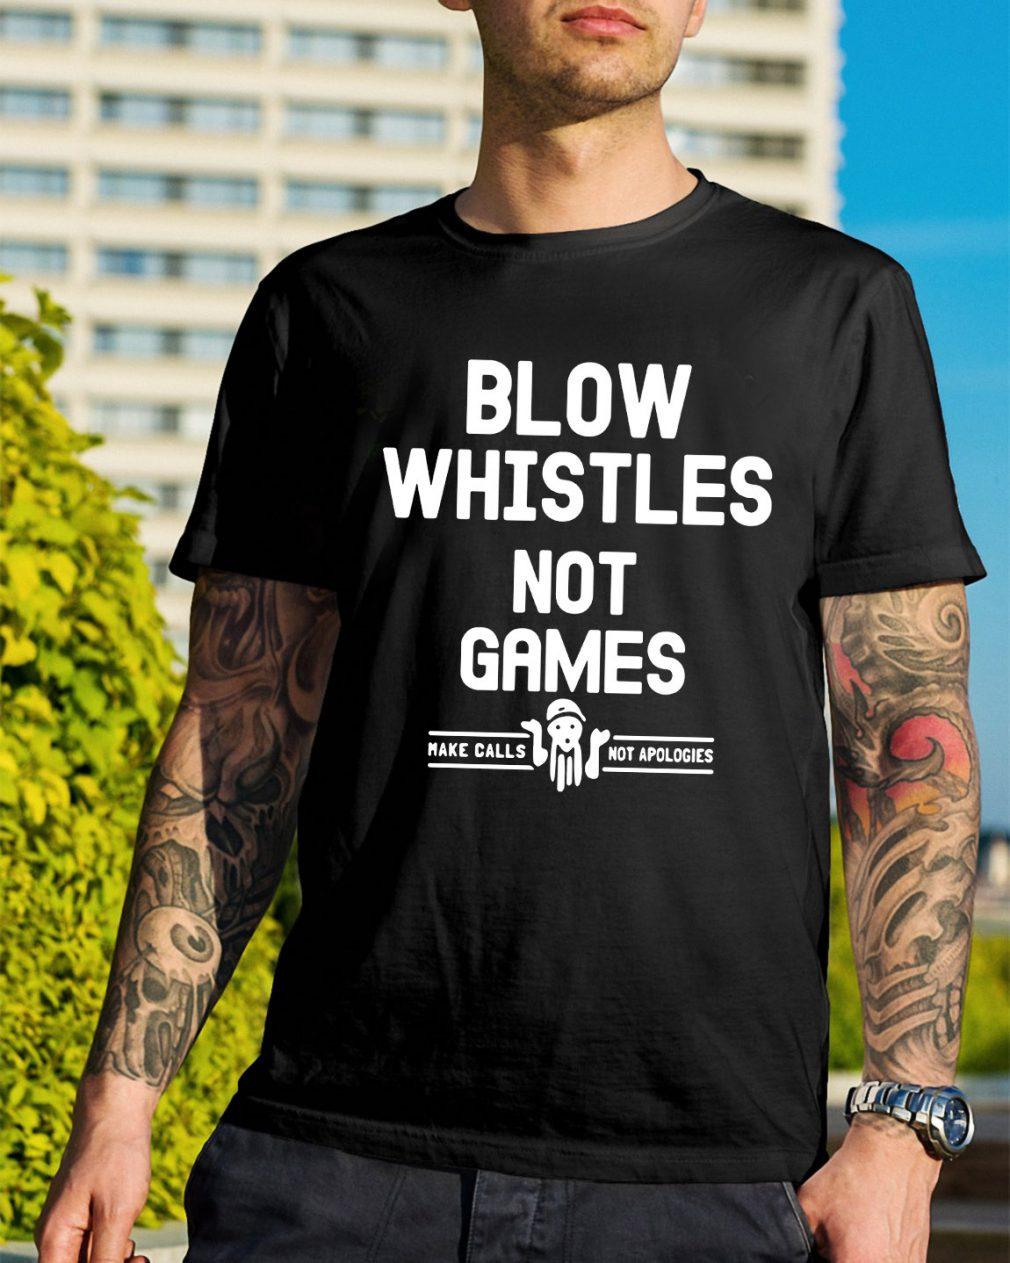 Blow whistles not games make calls not apologies shirt